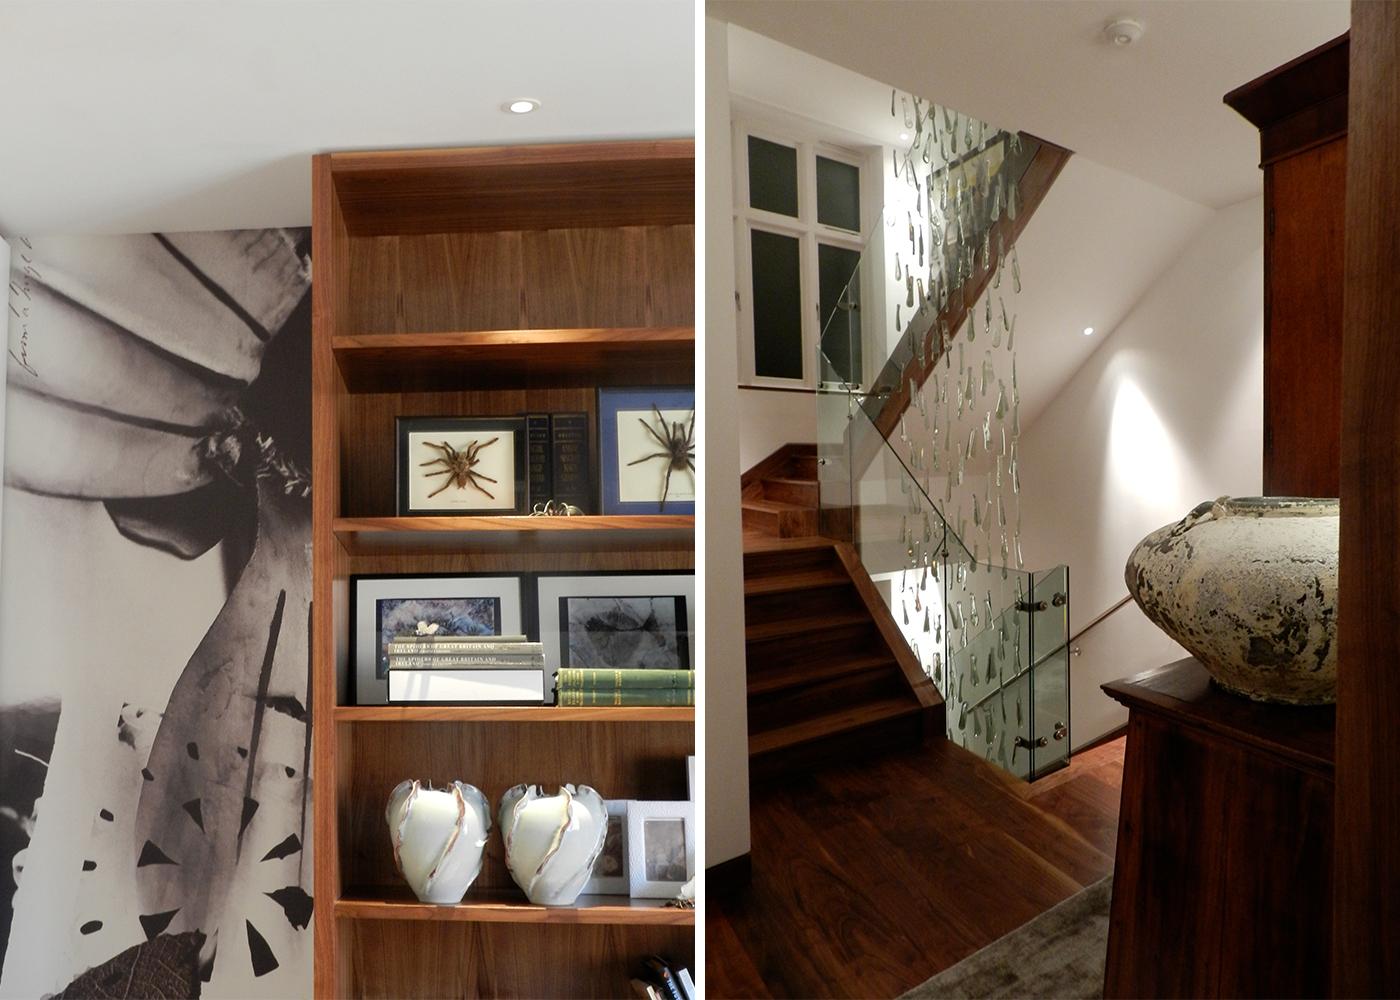 1_Hampstead_B_Collages.jpg